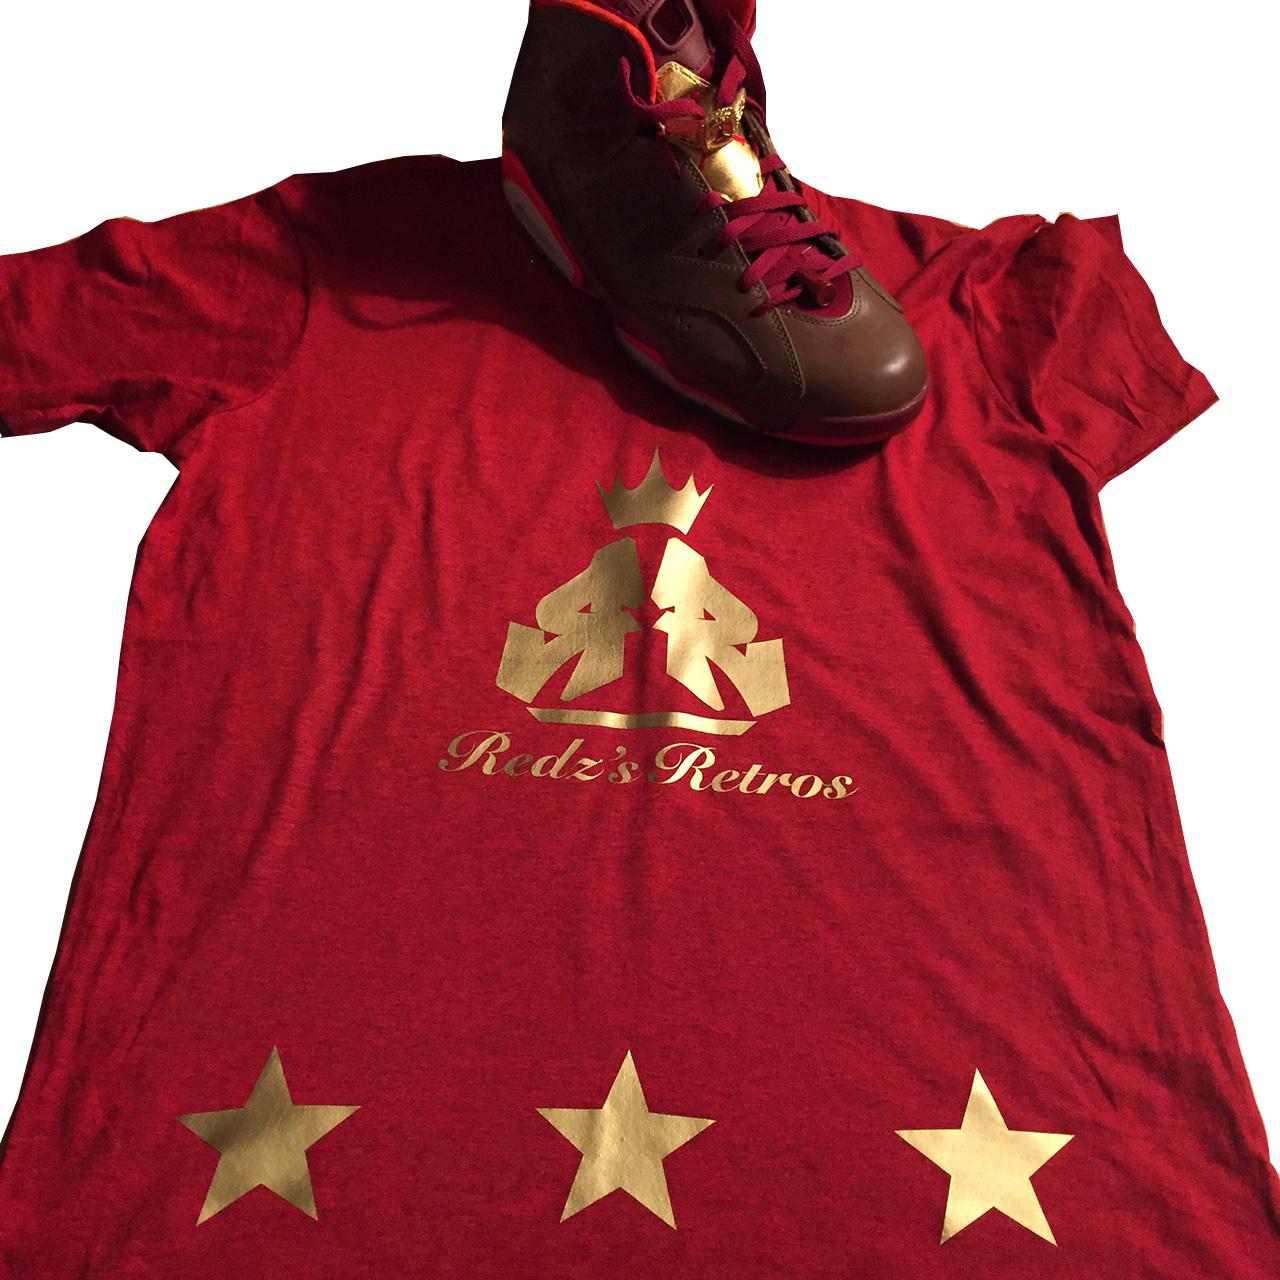 T-shirt to match Jordan 6 - Champagne or Cigar on Storenvy 407613157